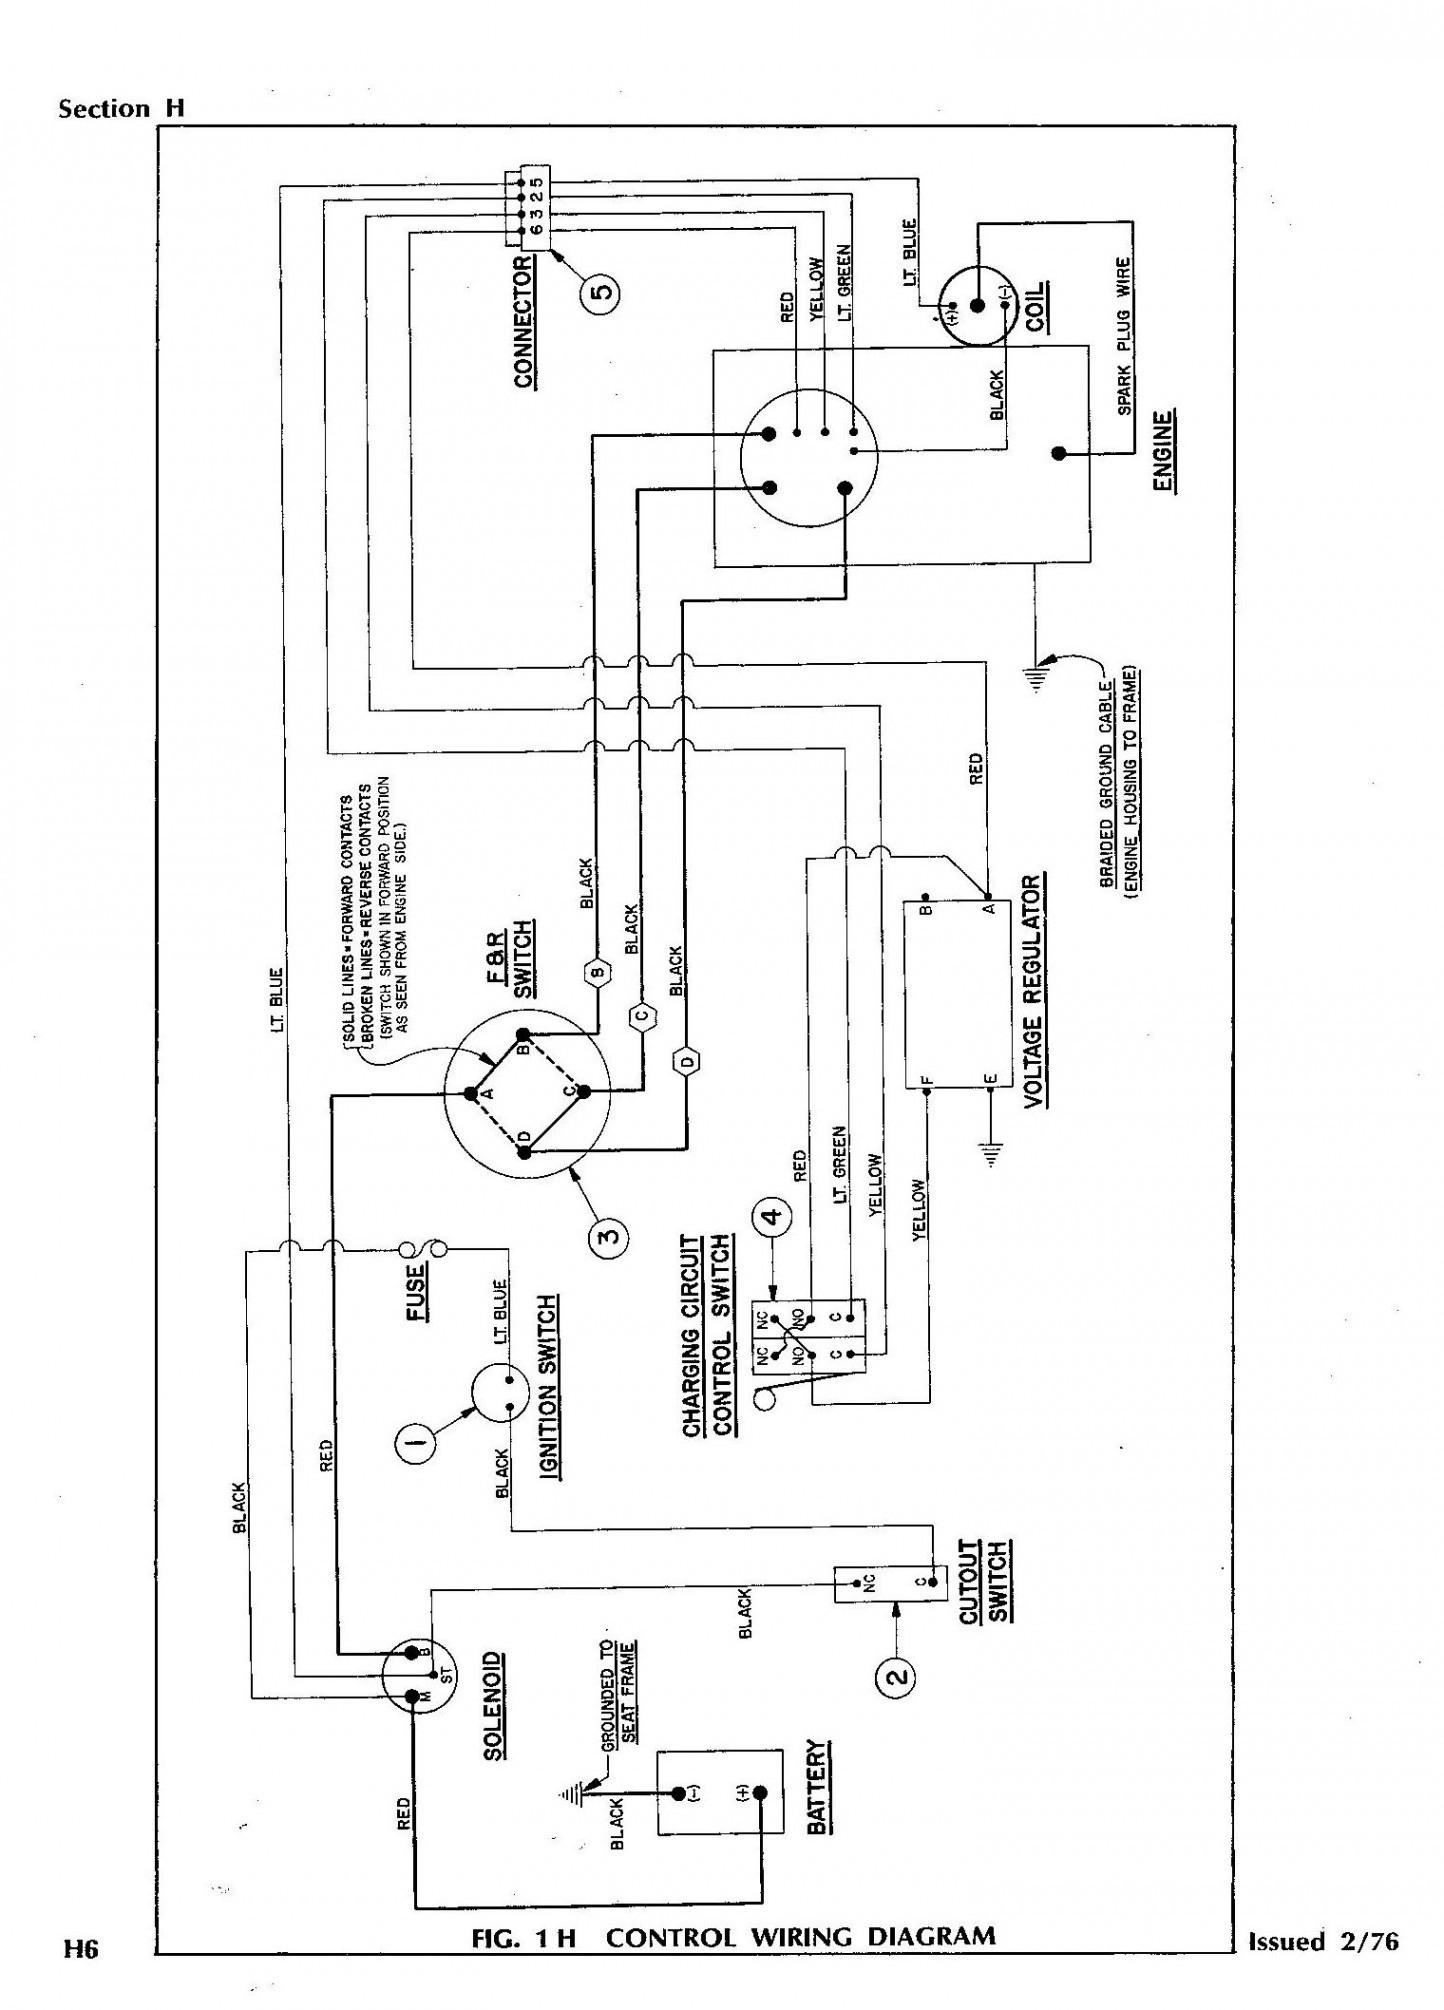 Golf Cart Switch Wiring Diagram | Wiring Diagram - Ezgo Forward Reverse Switch Wiring Diagram